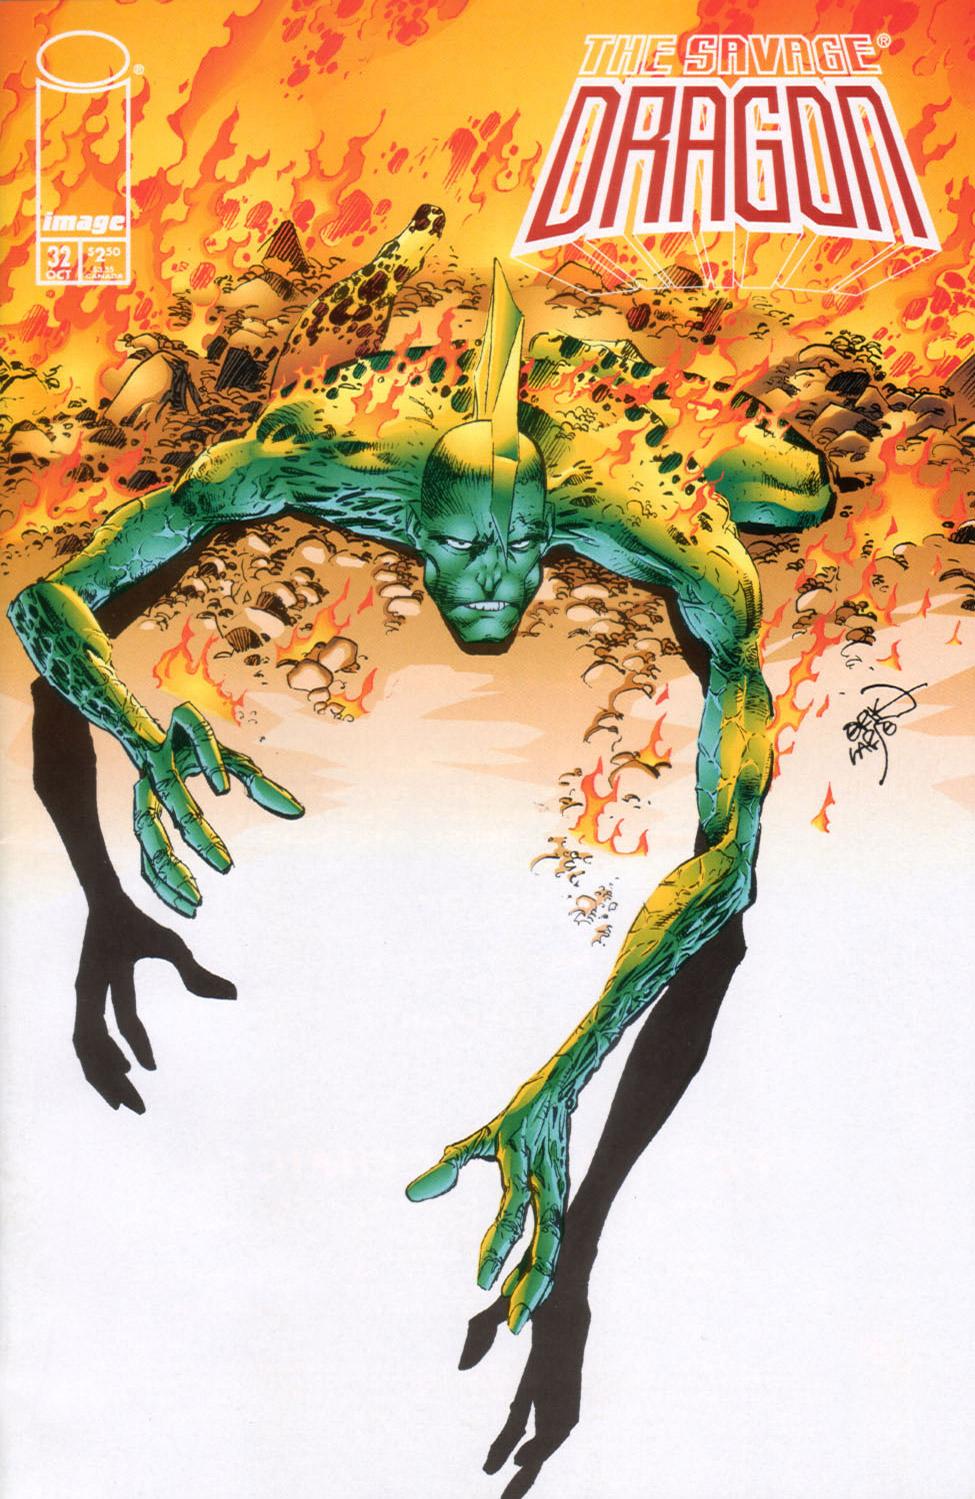 Cover Savage Dragon Vol.2 #32